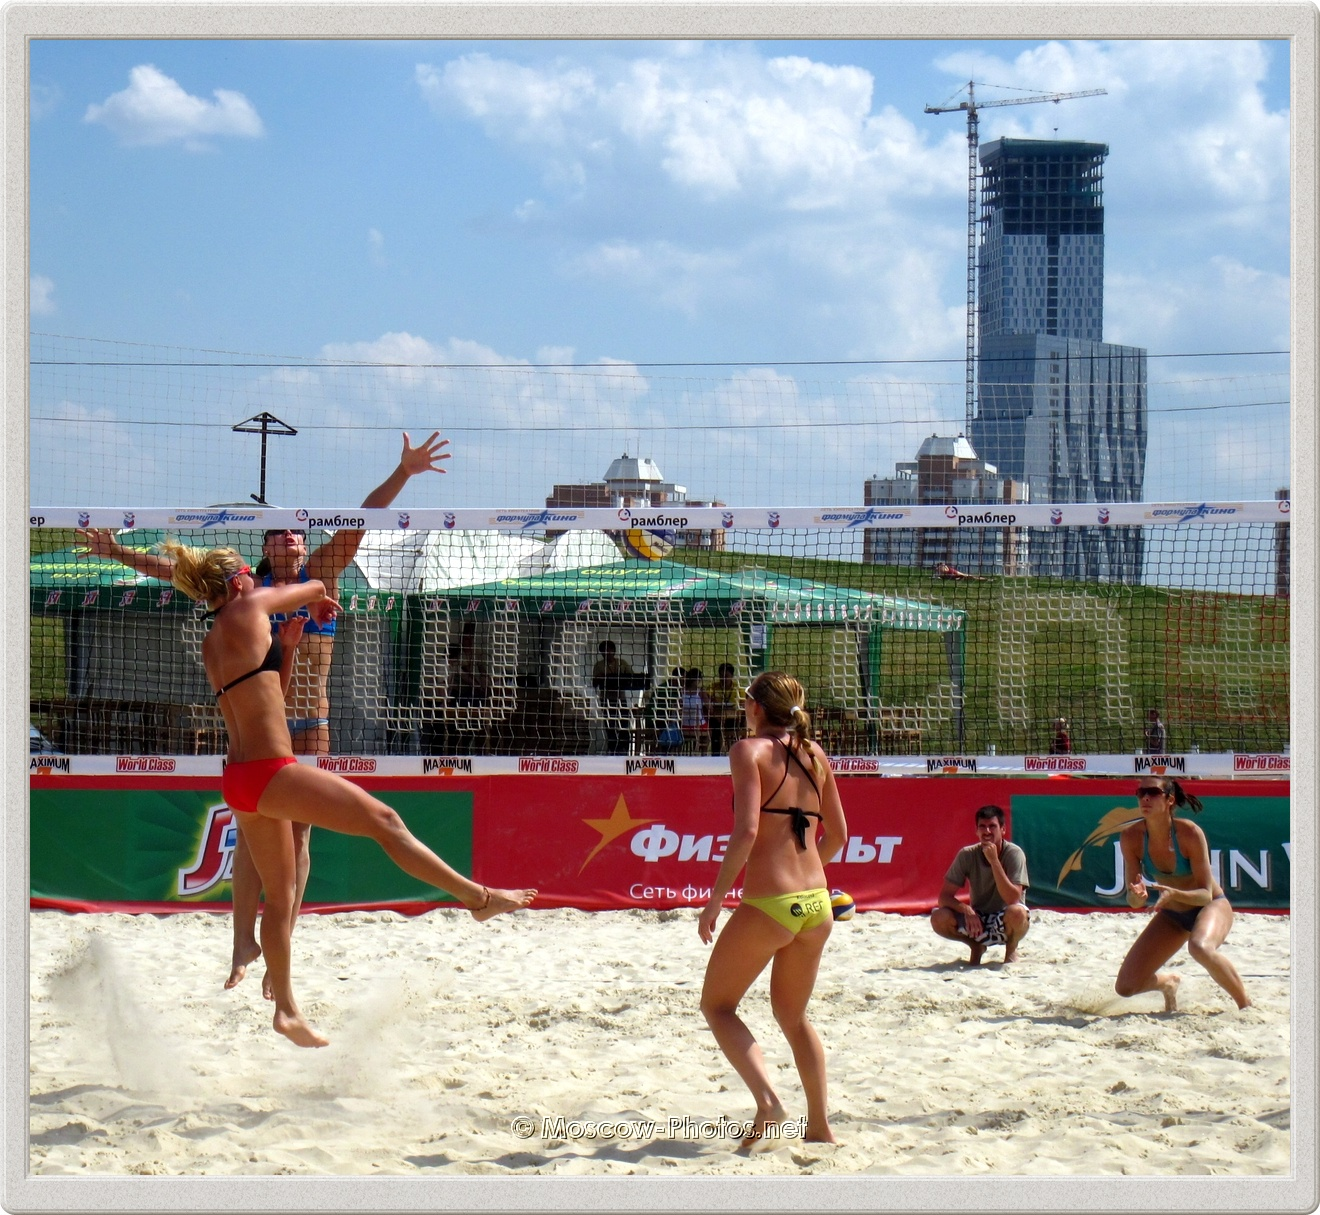 Hard Attack of Marketa Slukova from Czech Beach Volleyball Team